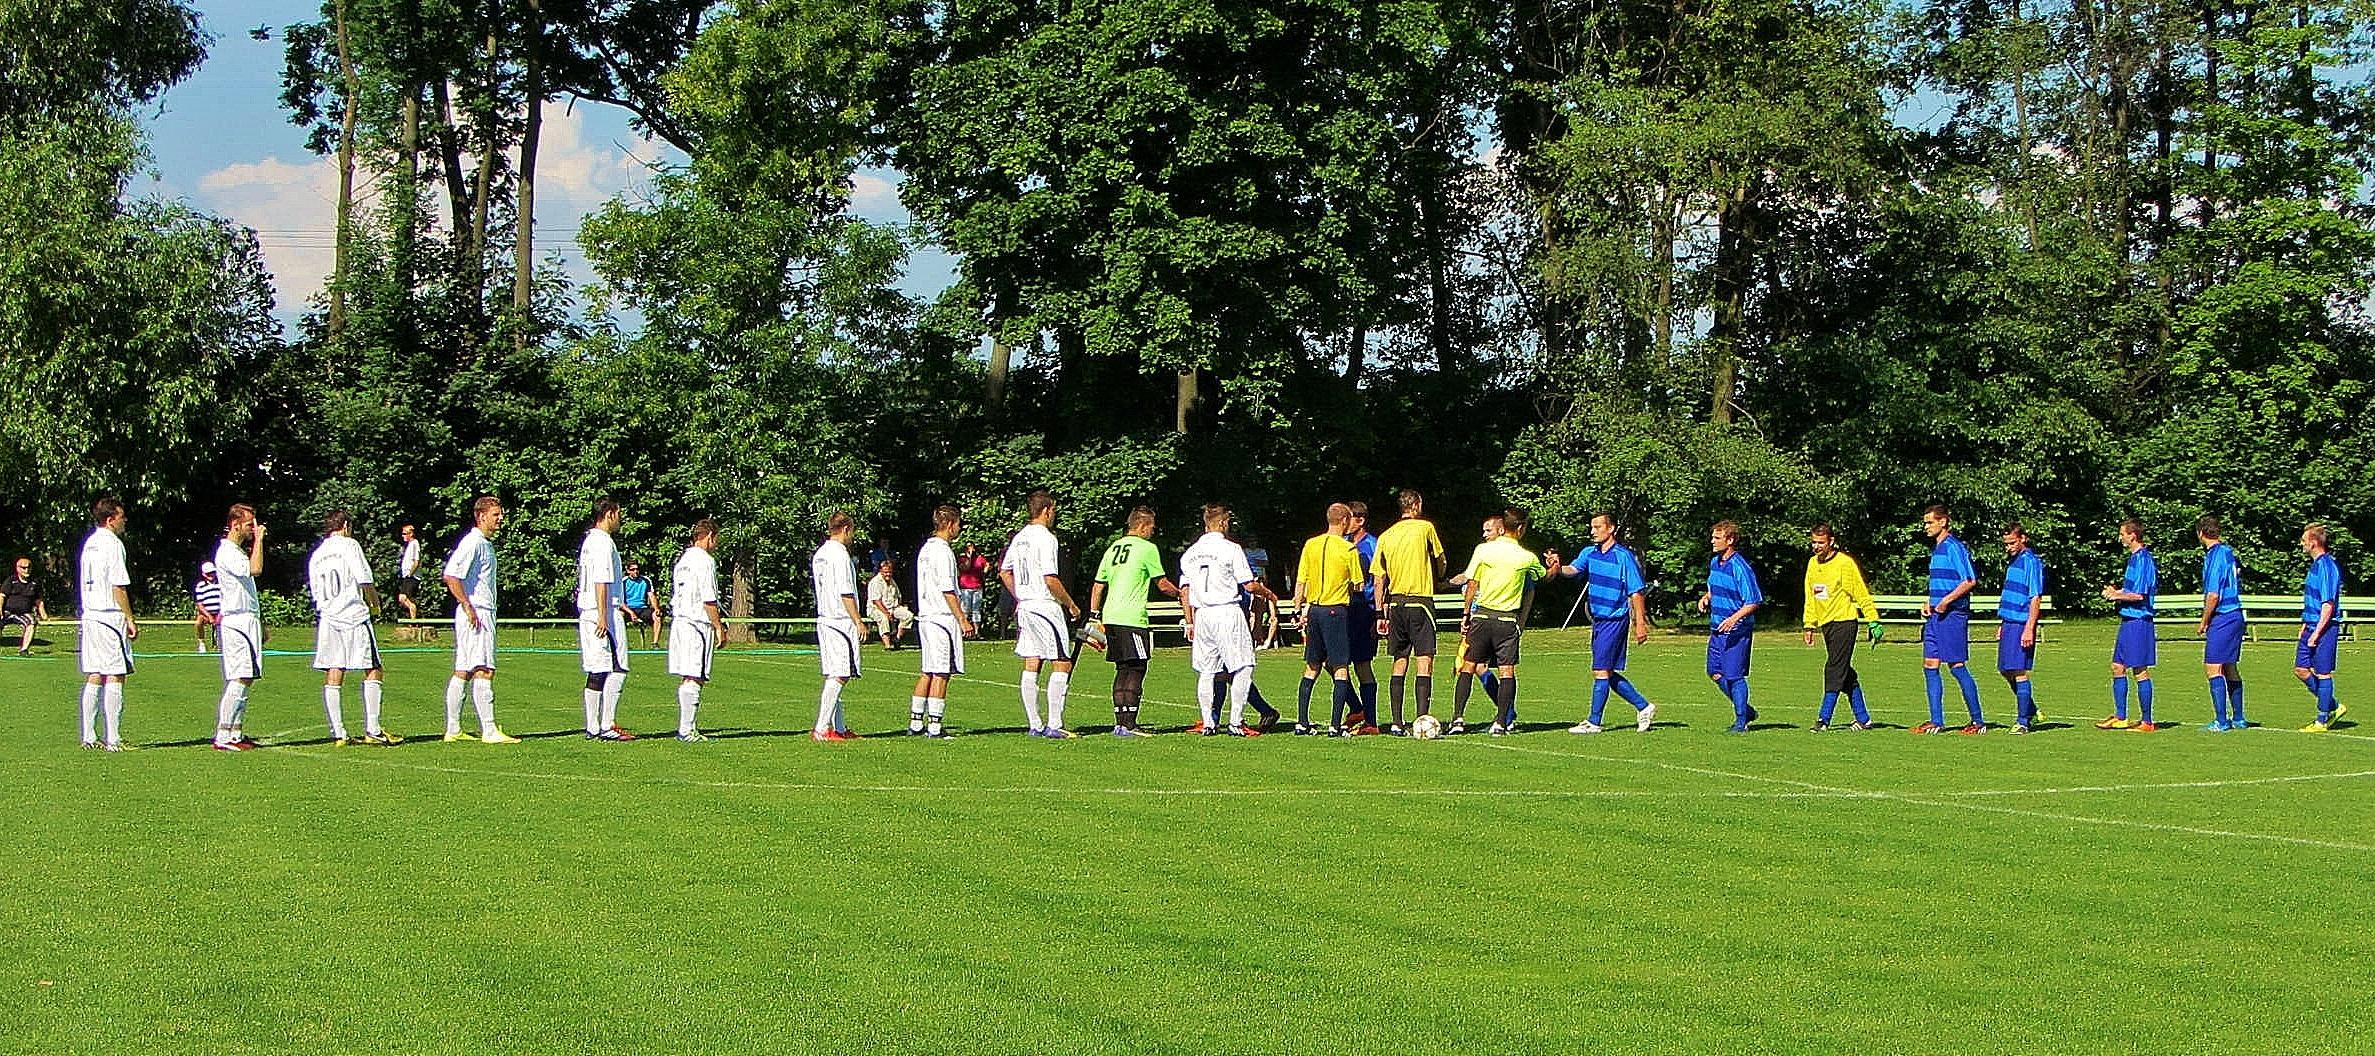 Sokol Mostkovice - Sokol Čechovice 2:6 (0:3)